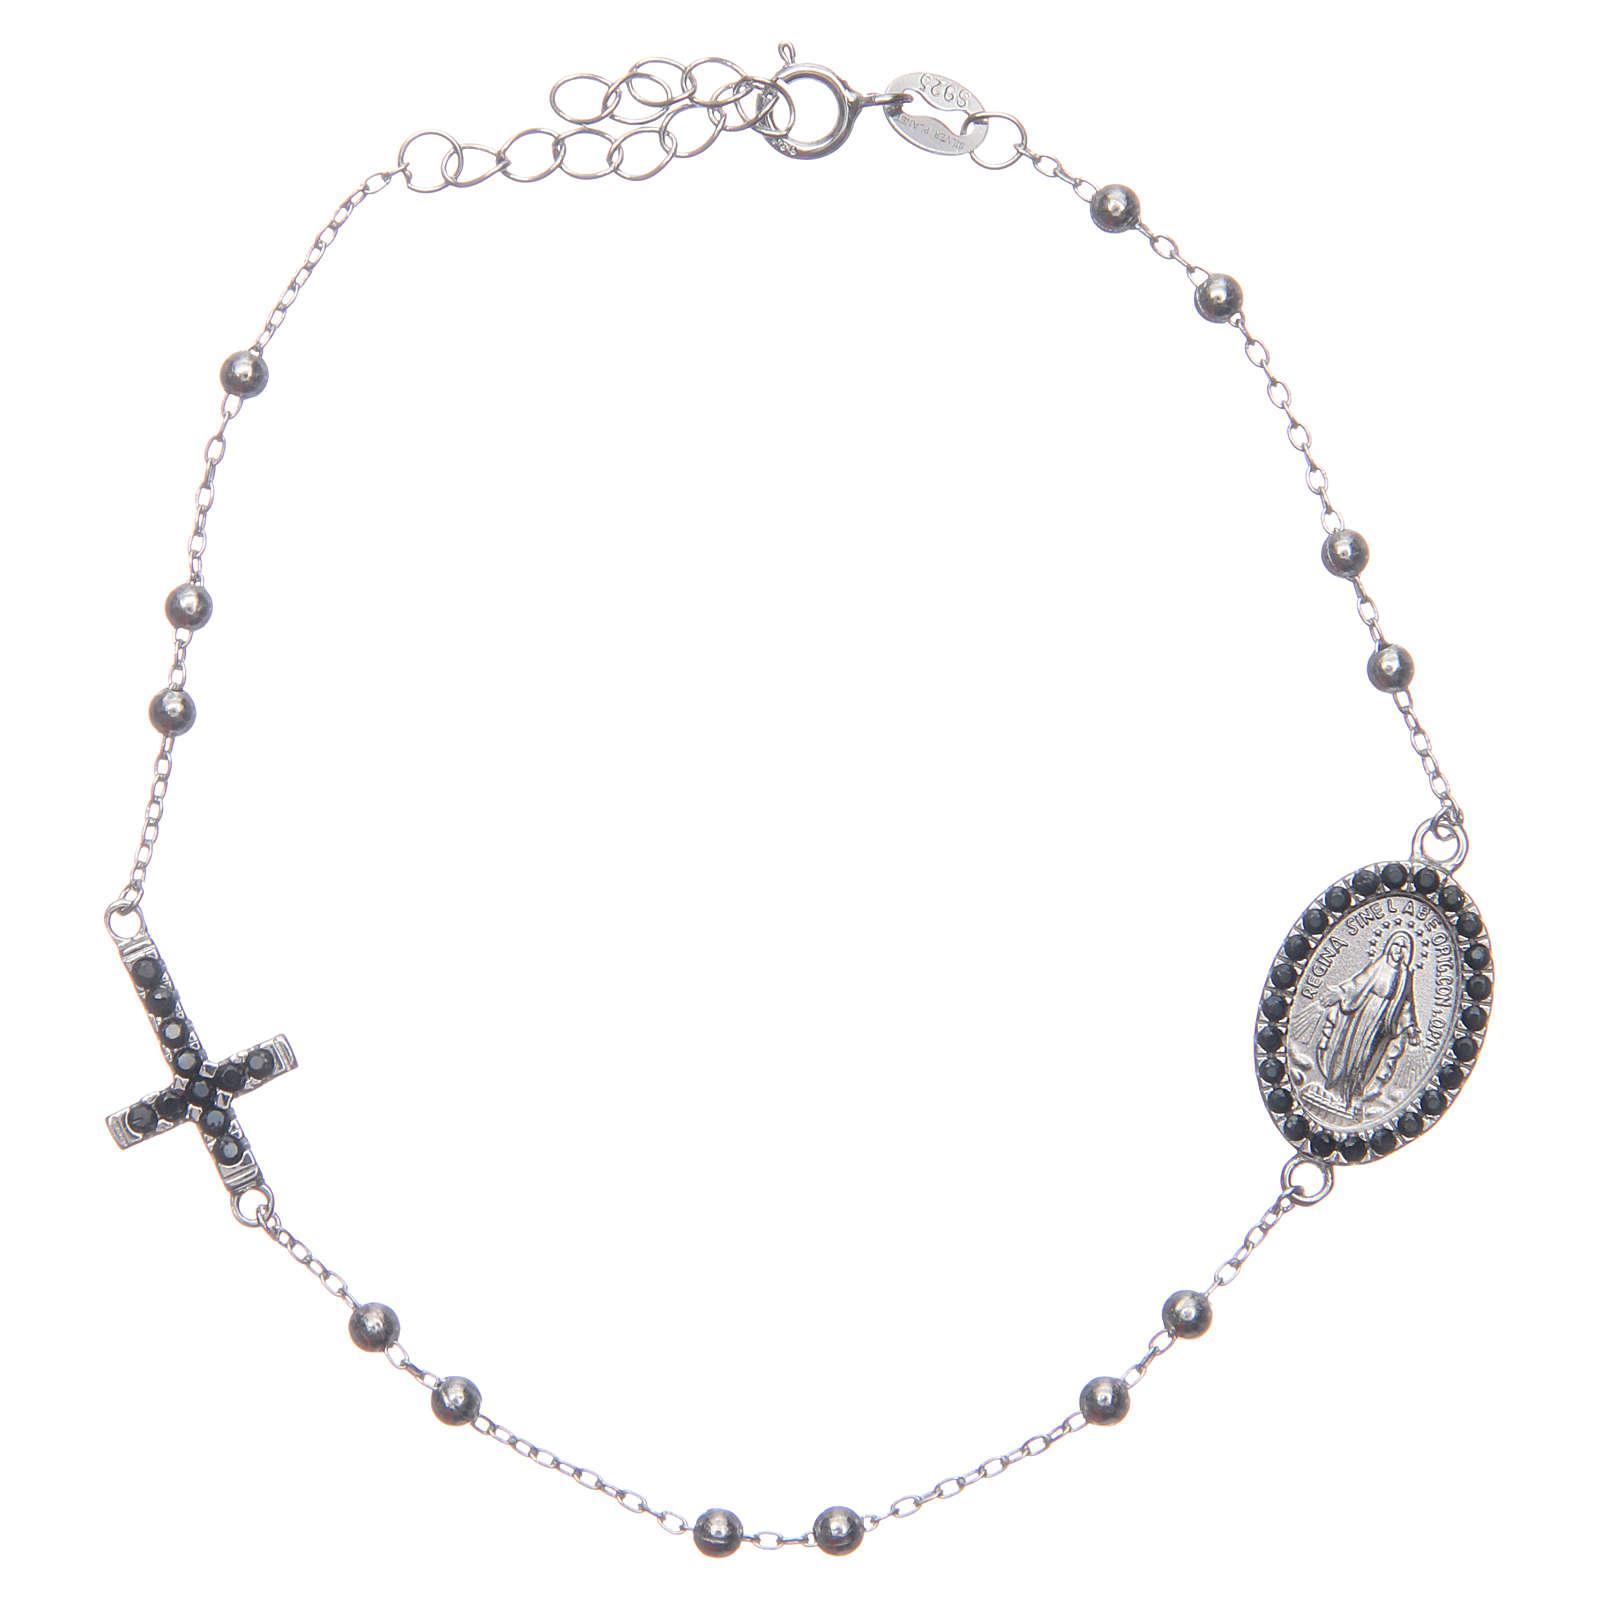 Bracciale rosario silver zirconi neri argento 925 4